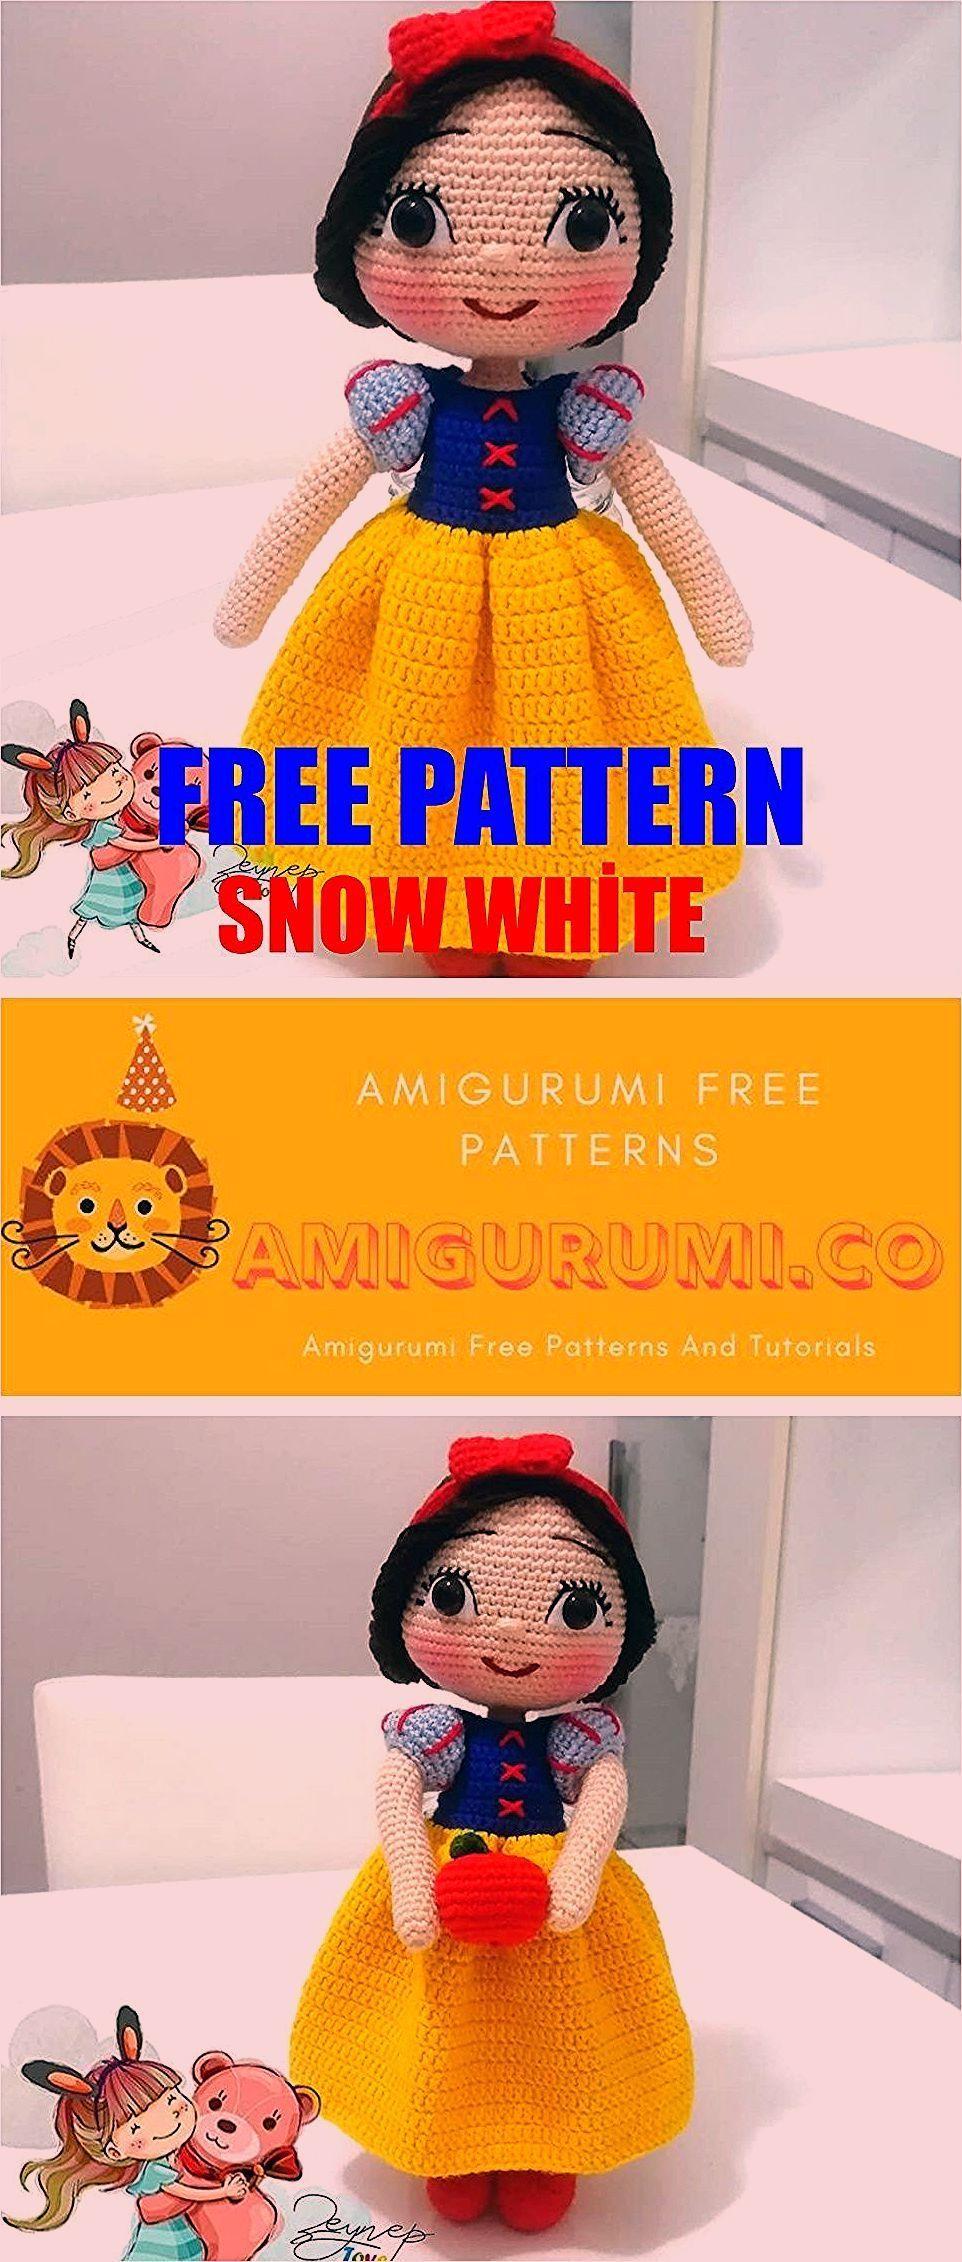 Photo of Amigurumi Snow White Free Crochet Pattern – Amigurumi Co, #Amigurumi # …